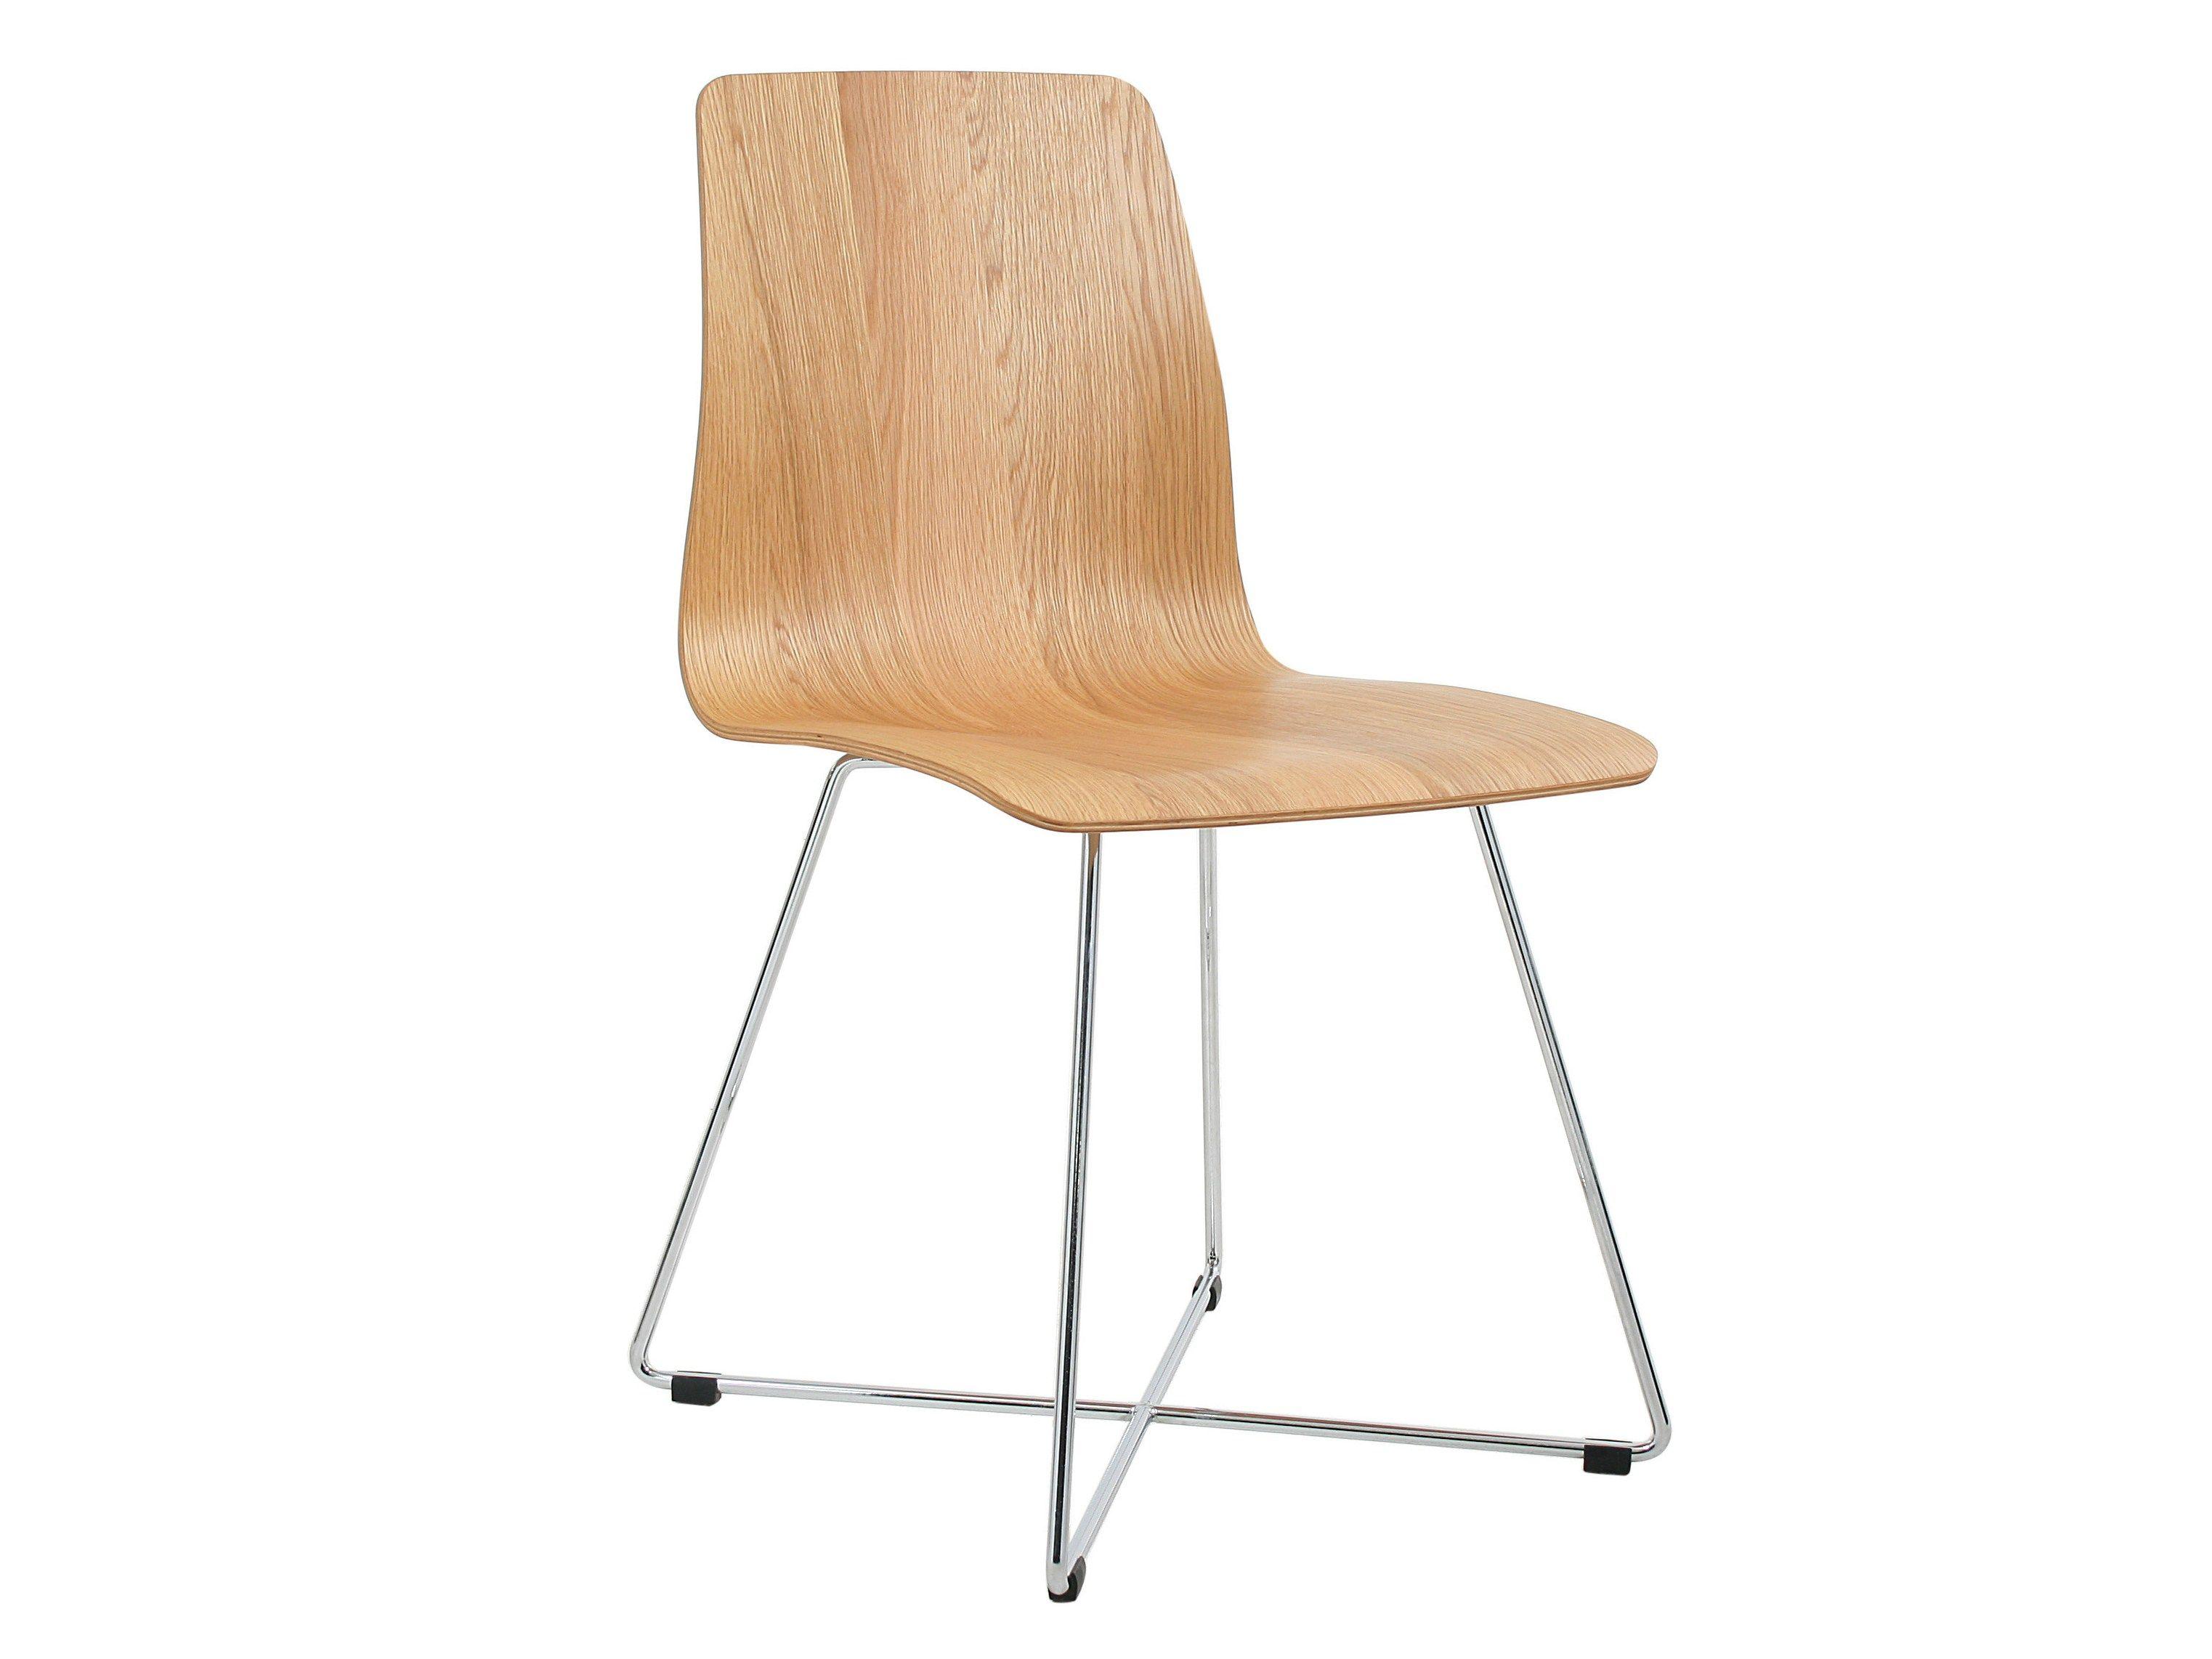 maverick sedia a slitta by kff design birgit hoffmann. Black Bedroom Furniture Sets. Home Design Ideas